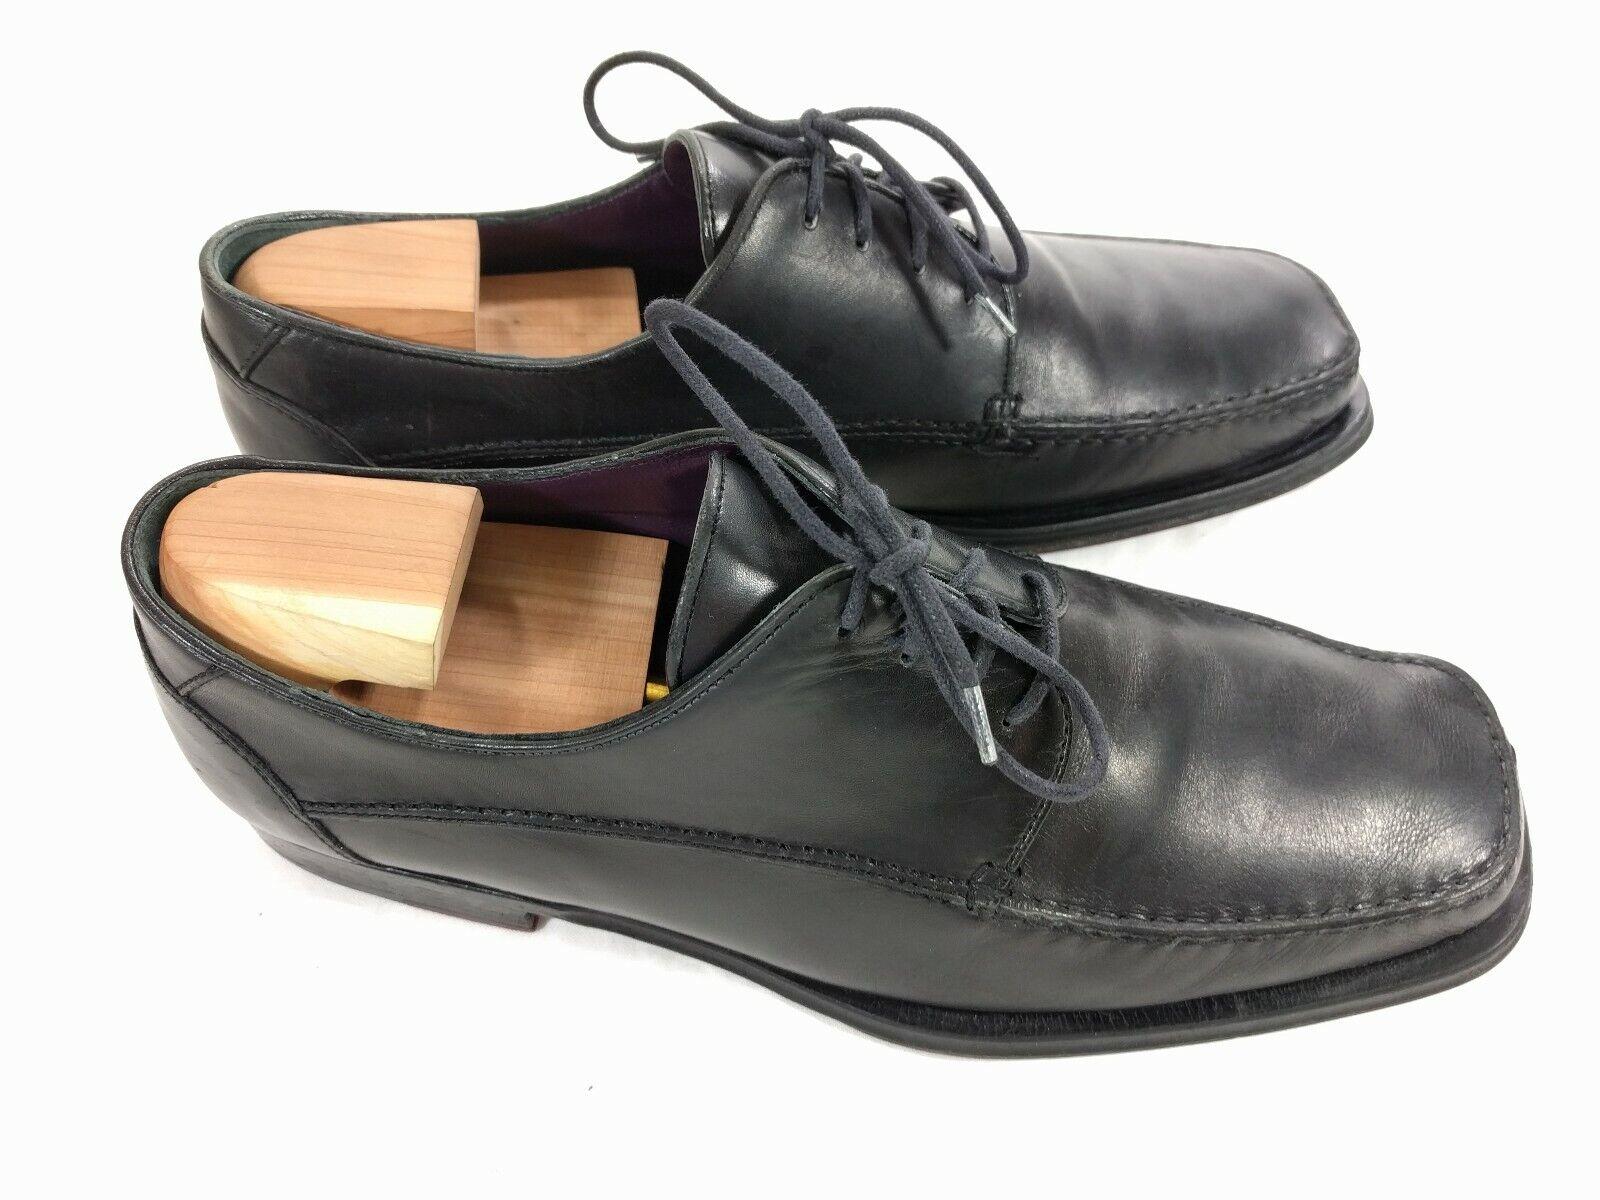 MENS BRUNO MAGLI NATE SIZE 9.5M BLACK Leather MOC Toe Oxfords shoes